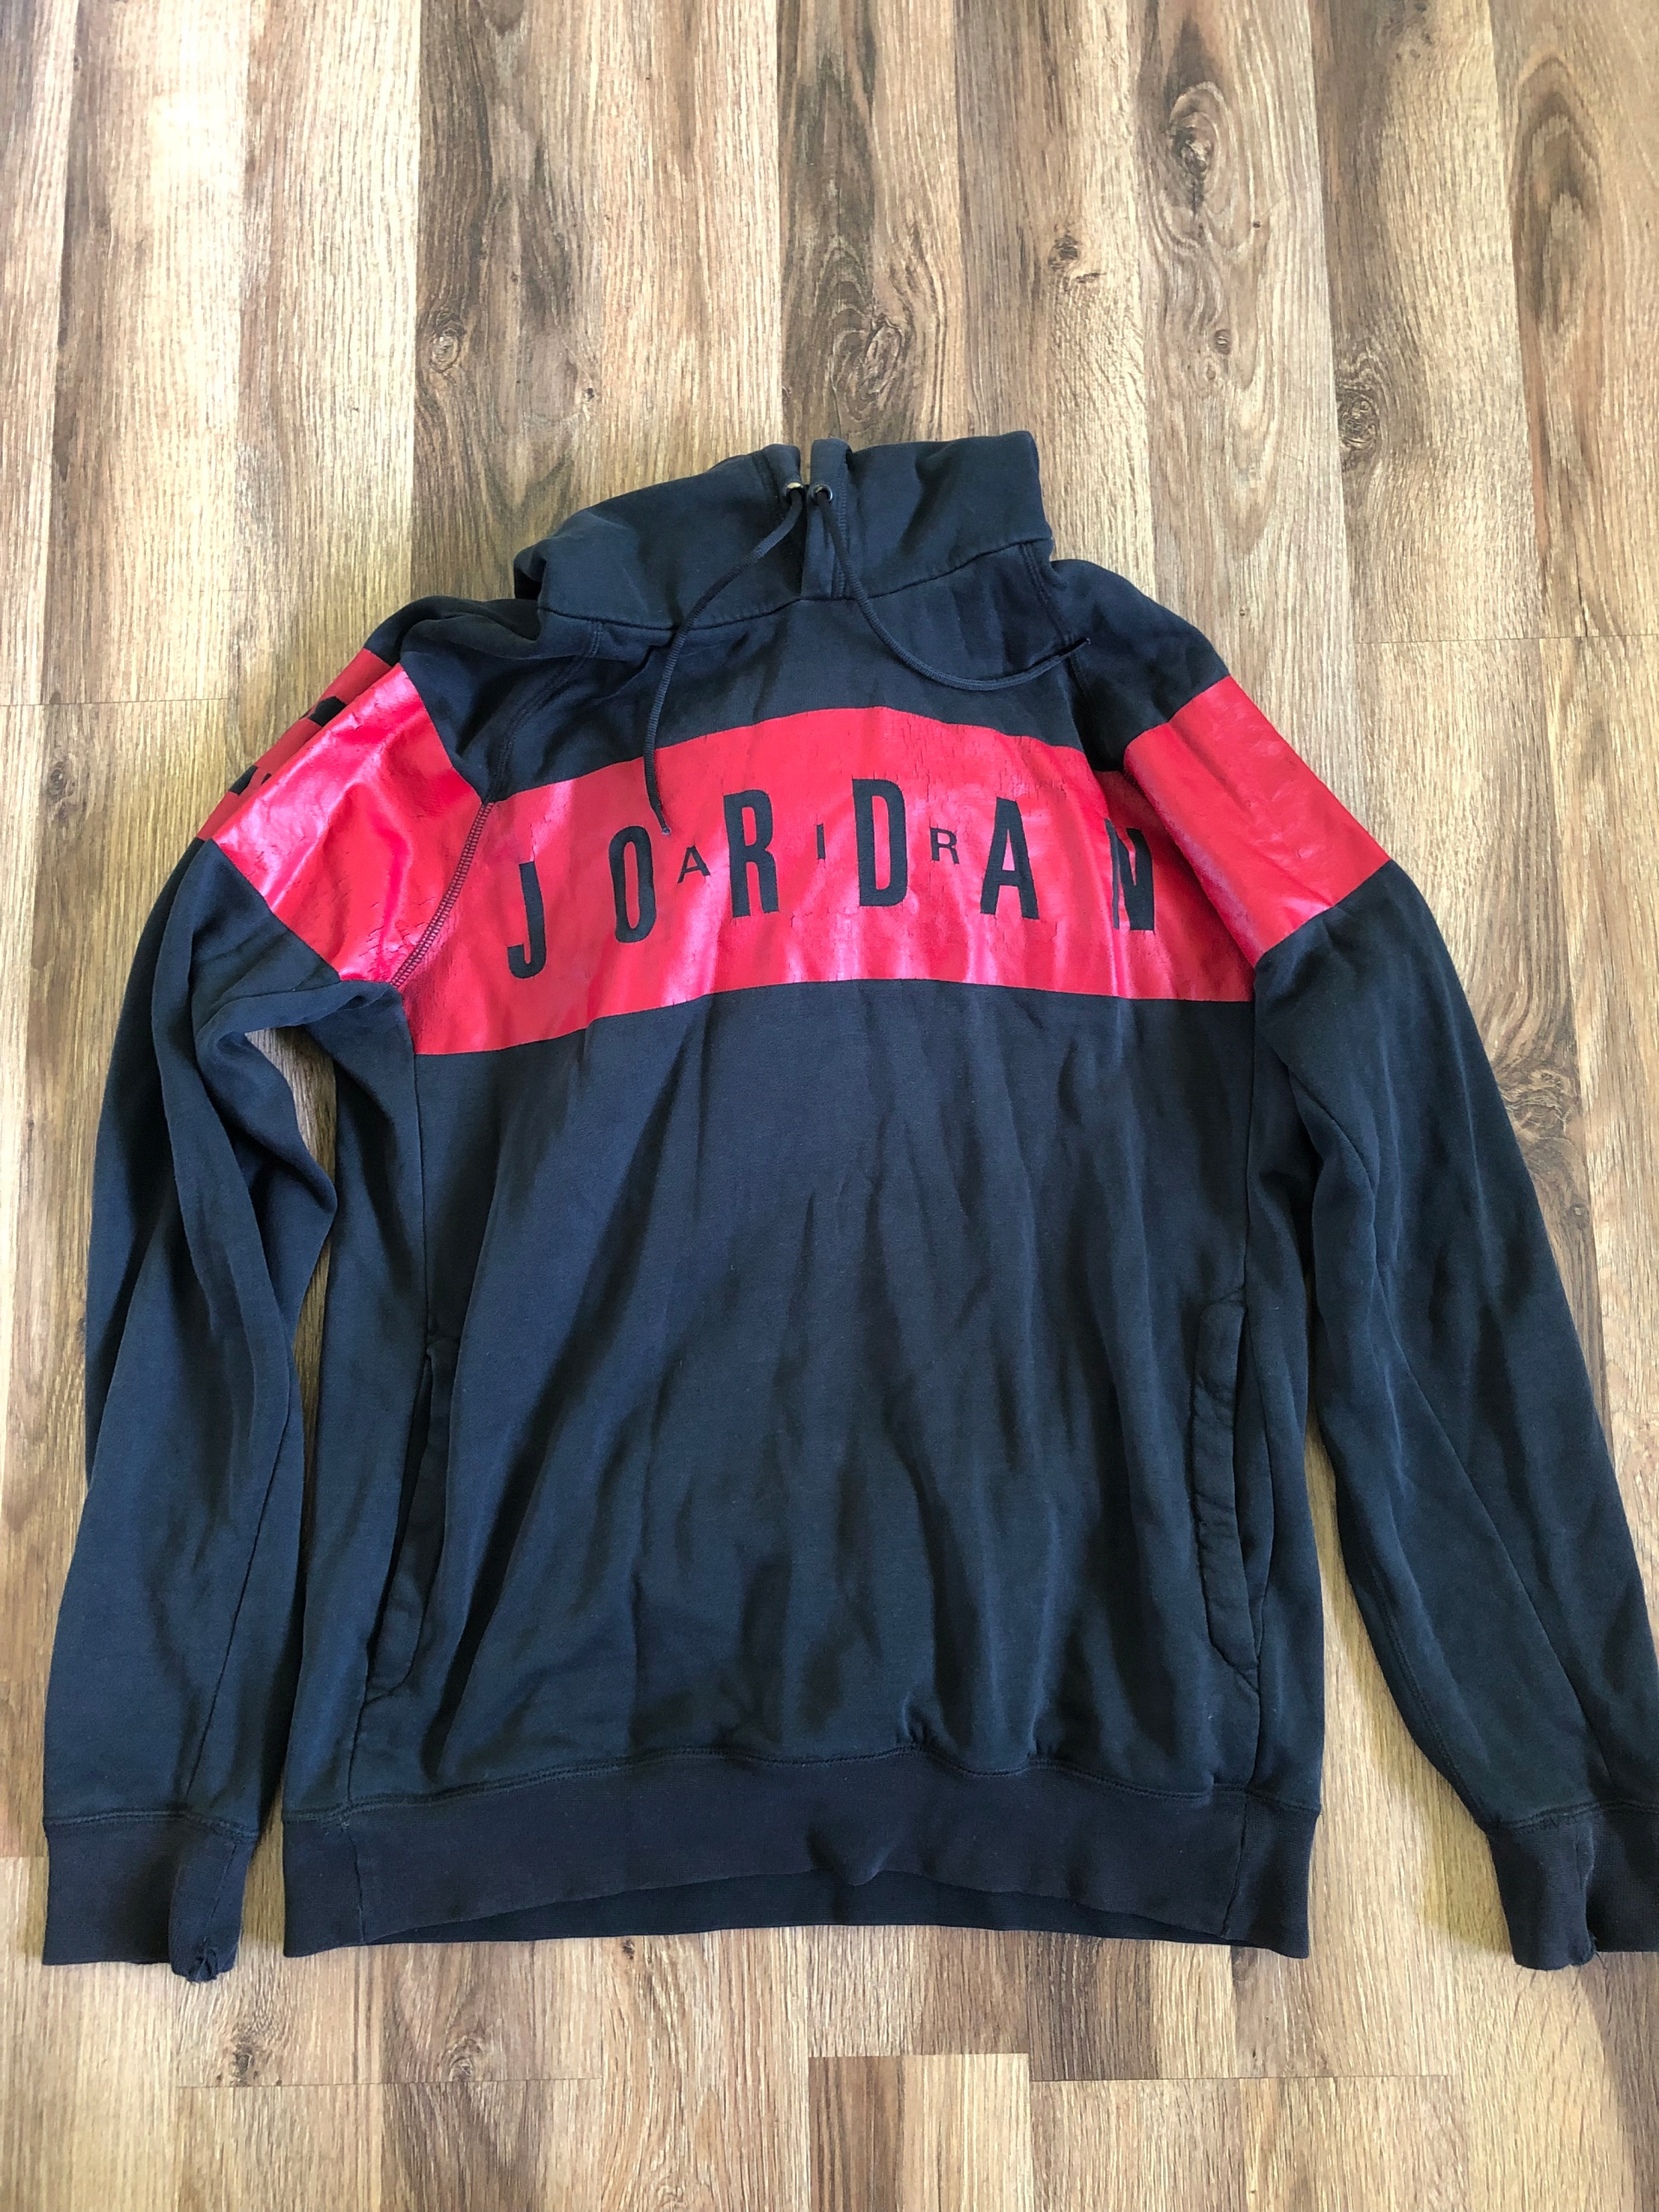 Jordan MAJORS BERSHKA HM bluzy spodnie S